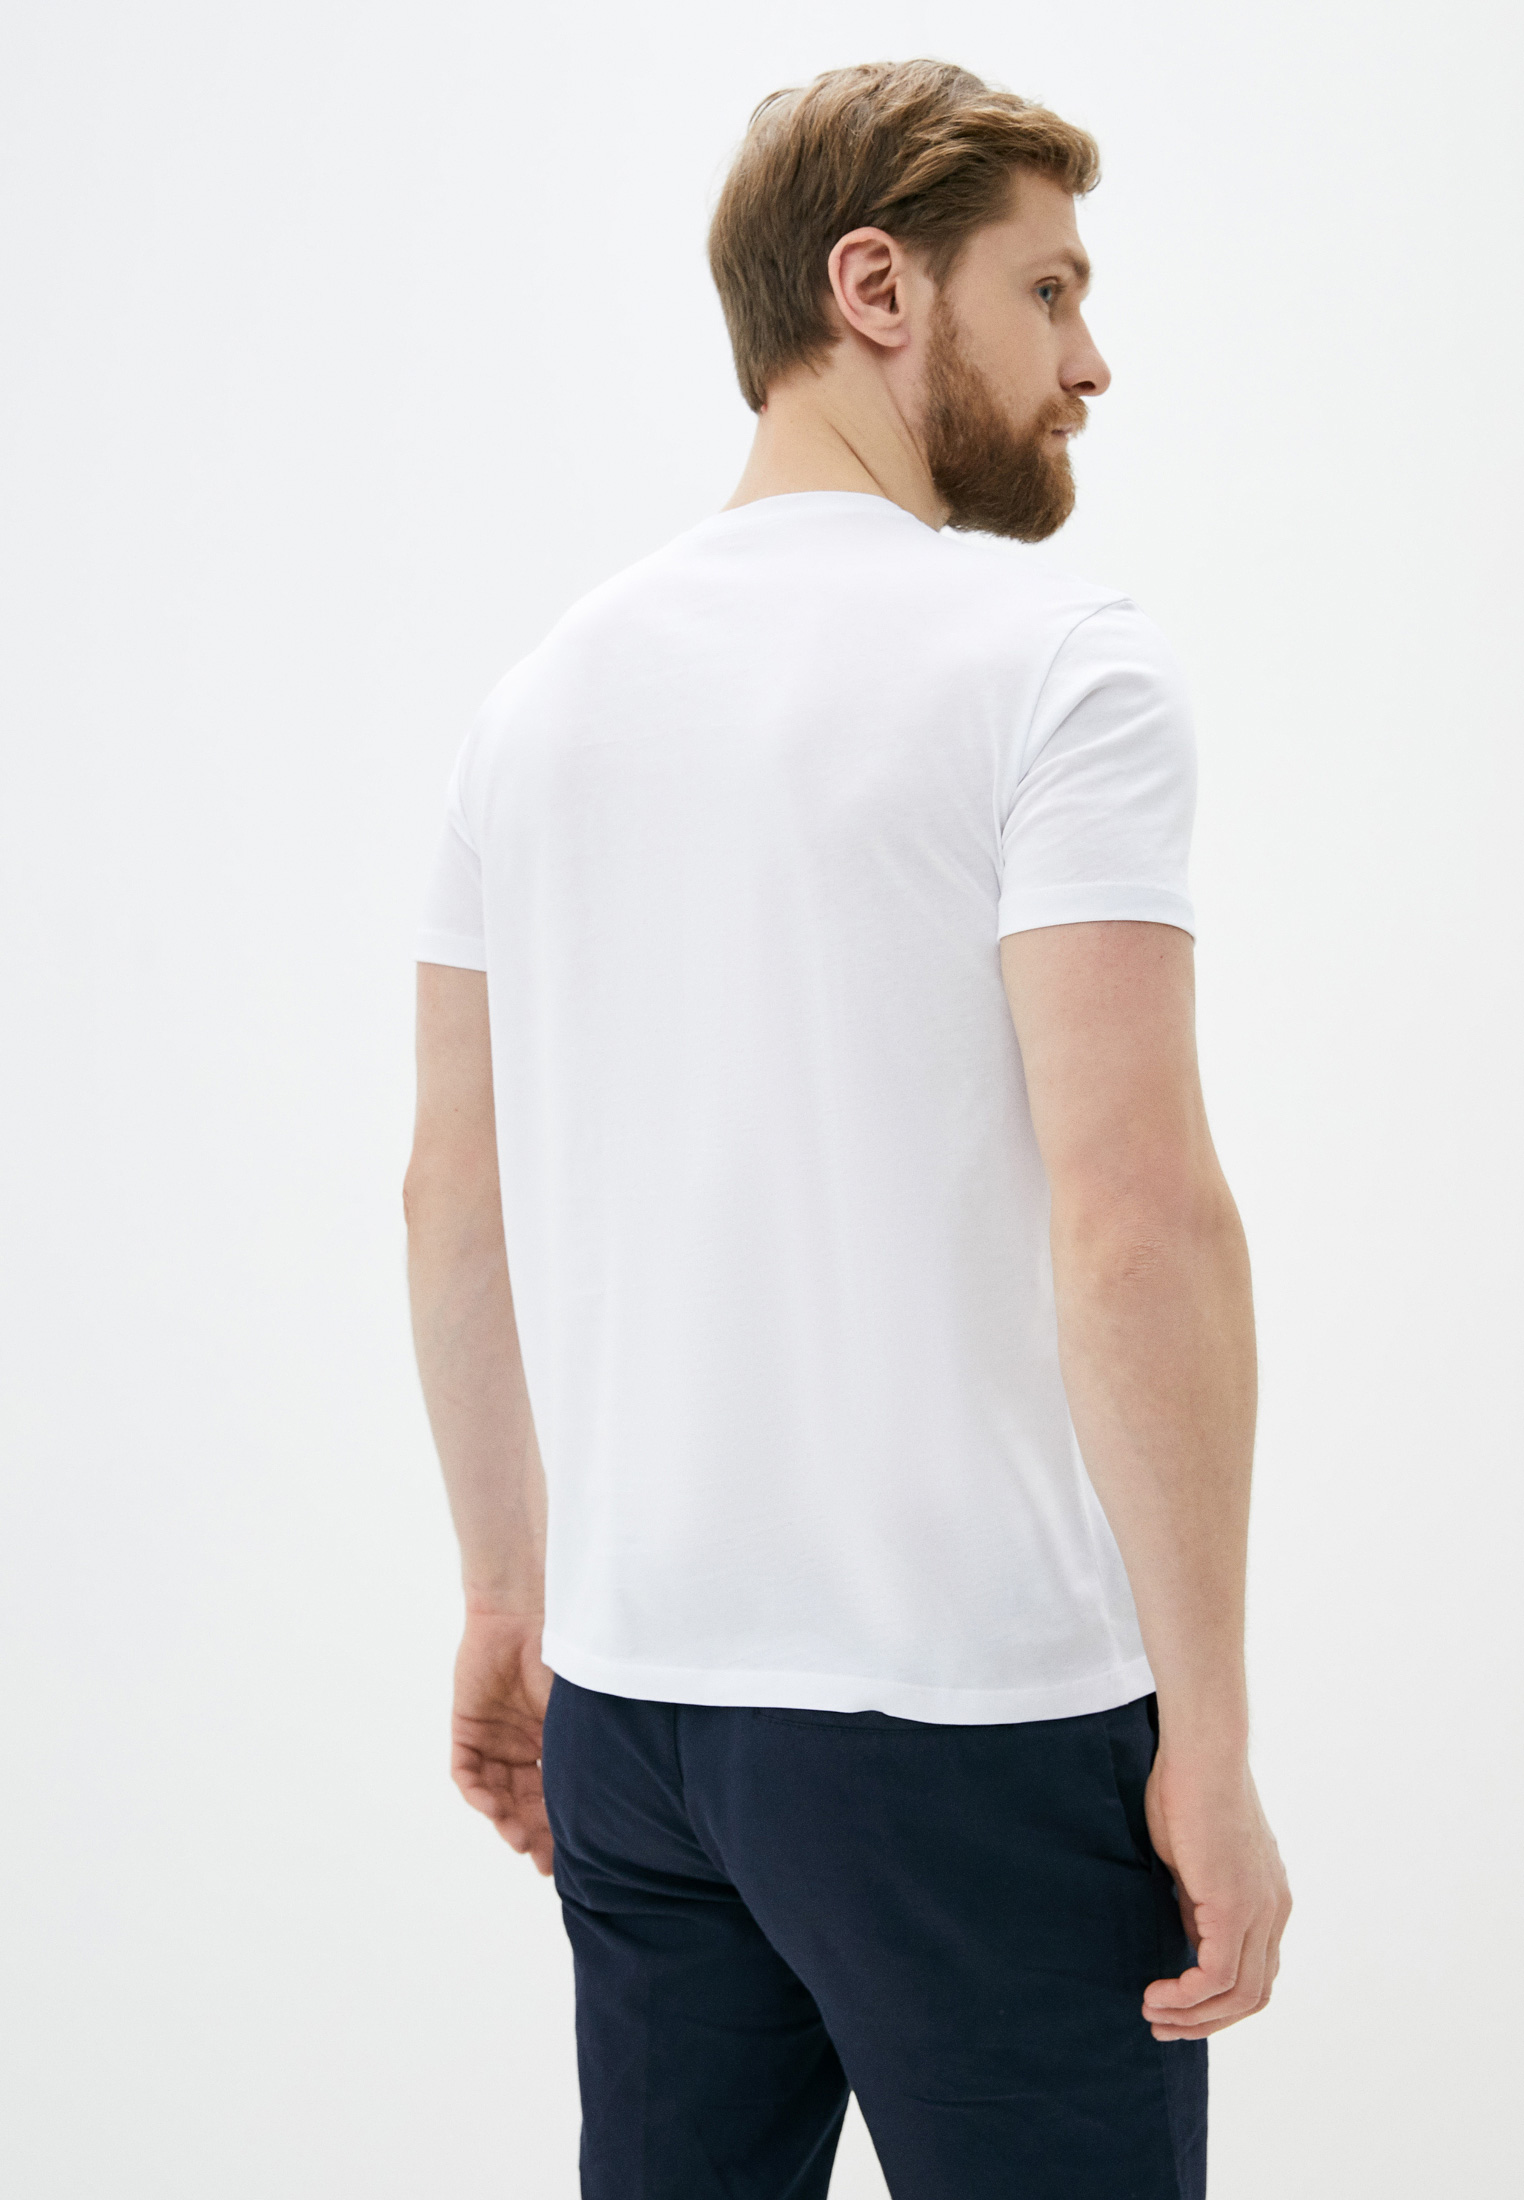 Мужская футболка TRUSSARDI JEANS (Труссарди Джинс) 52t00322: изображение 3